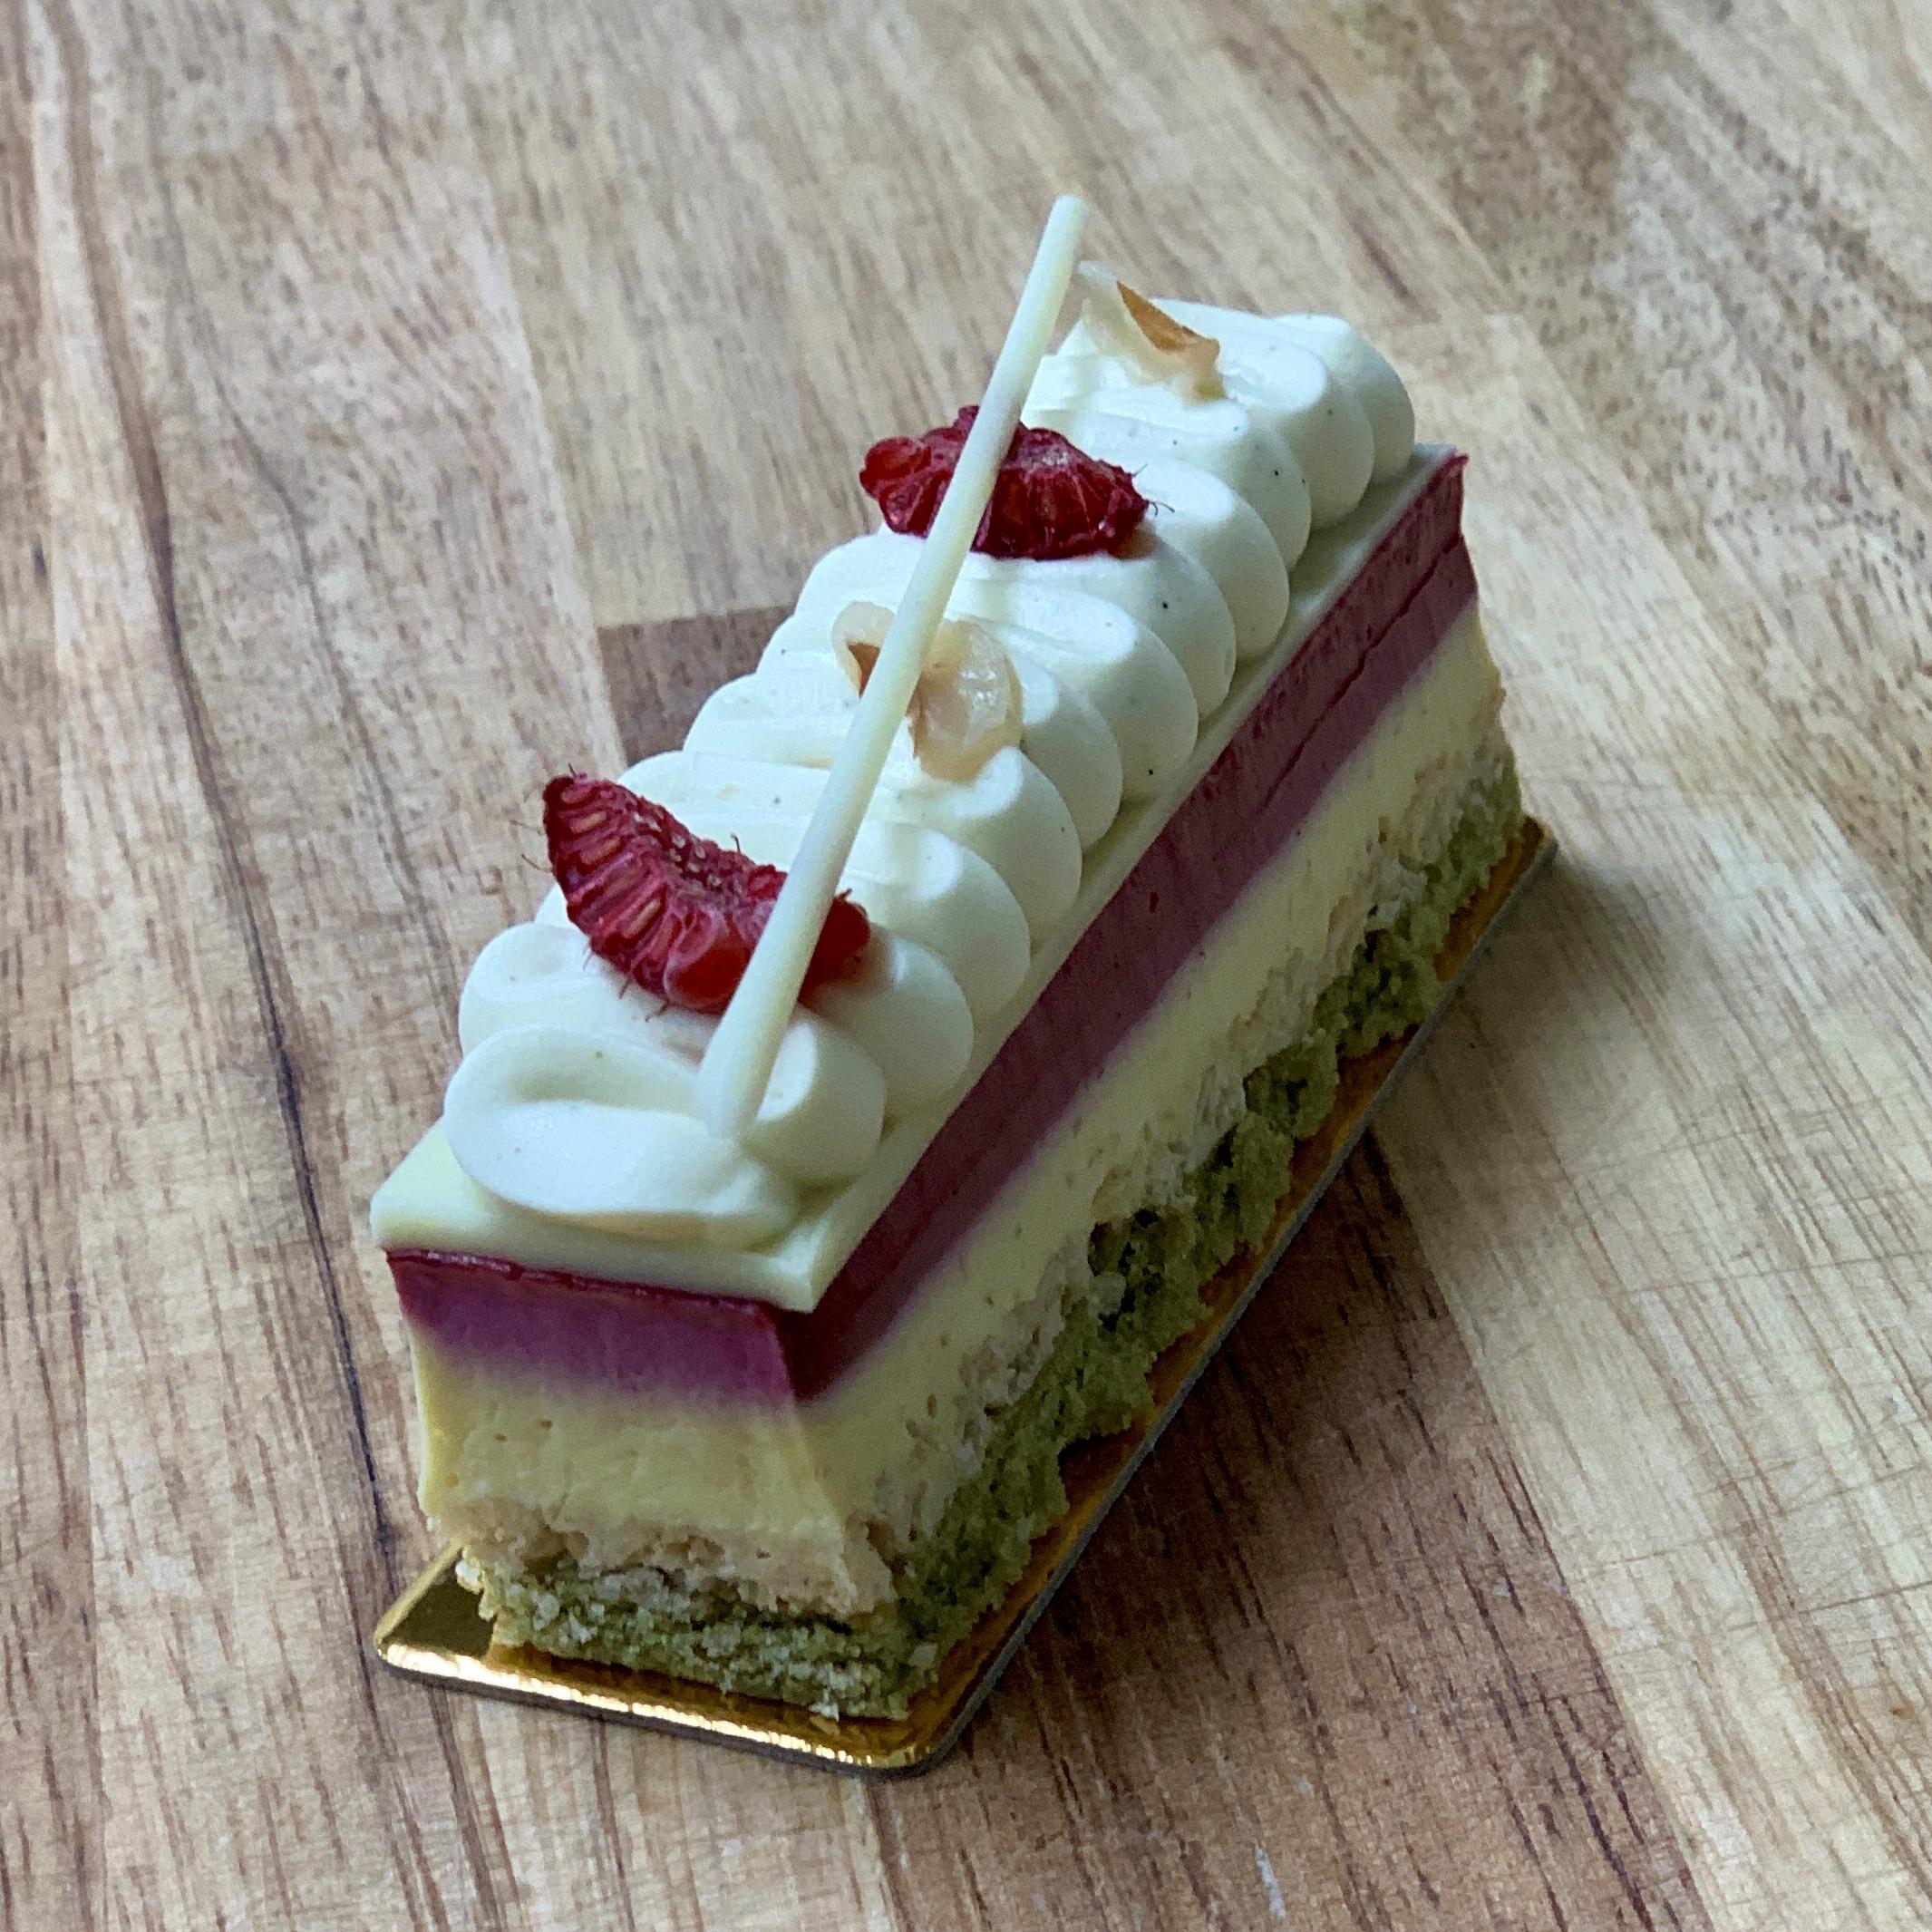 Valentine's day special cake raspberry lychee napoleon, valentine's day sweet, valentine's day cake, valentine's day gift, valentine's day gift ideas, atelier monnier french bakery miami